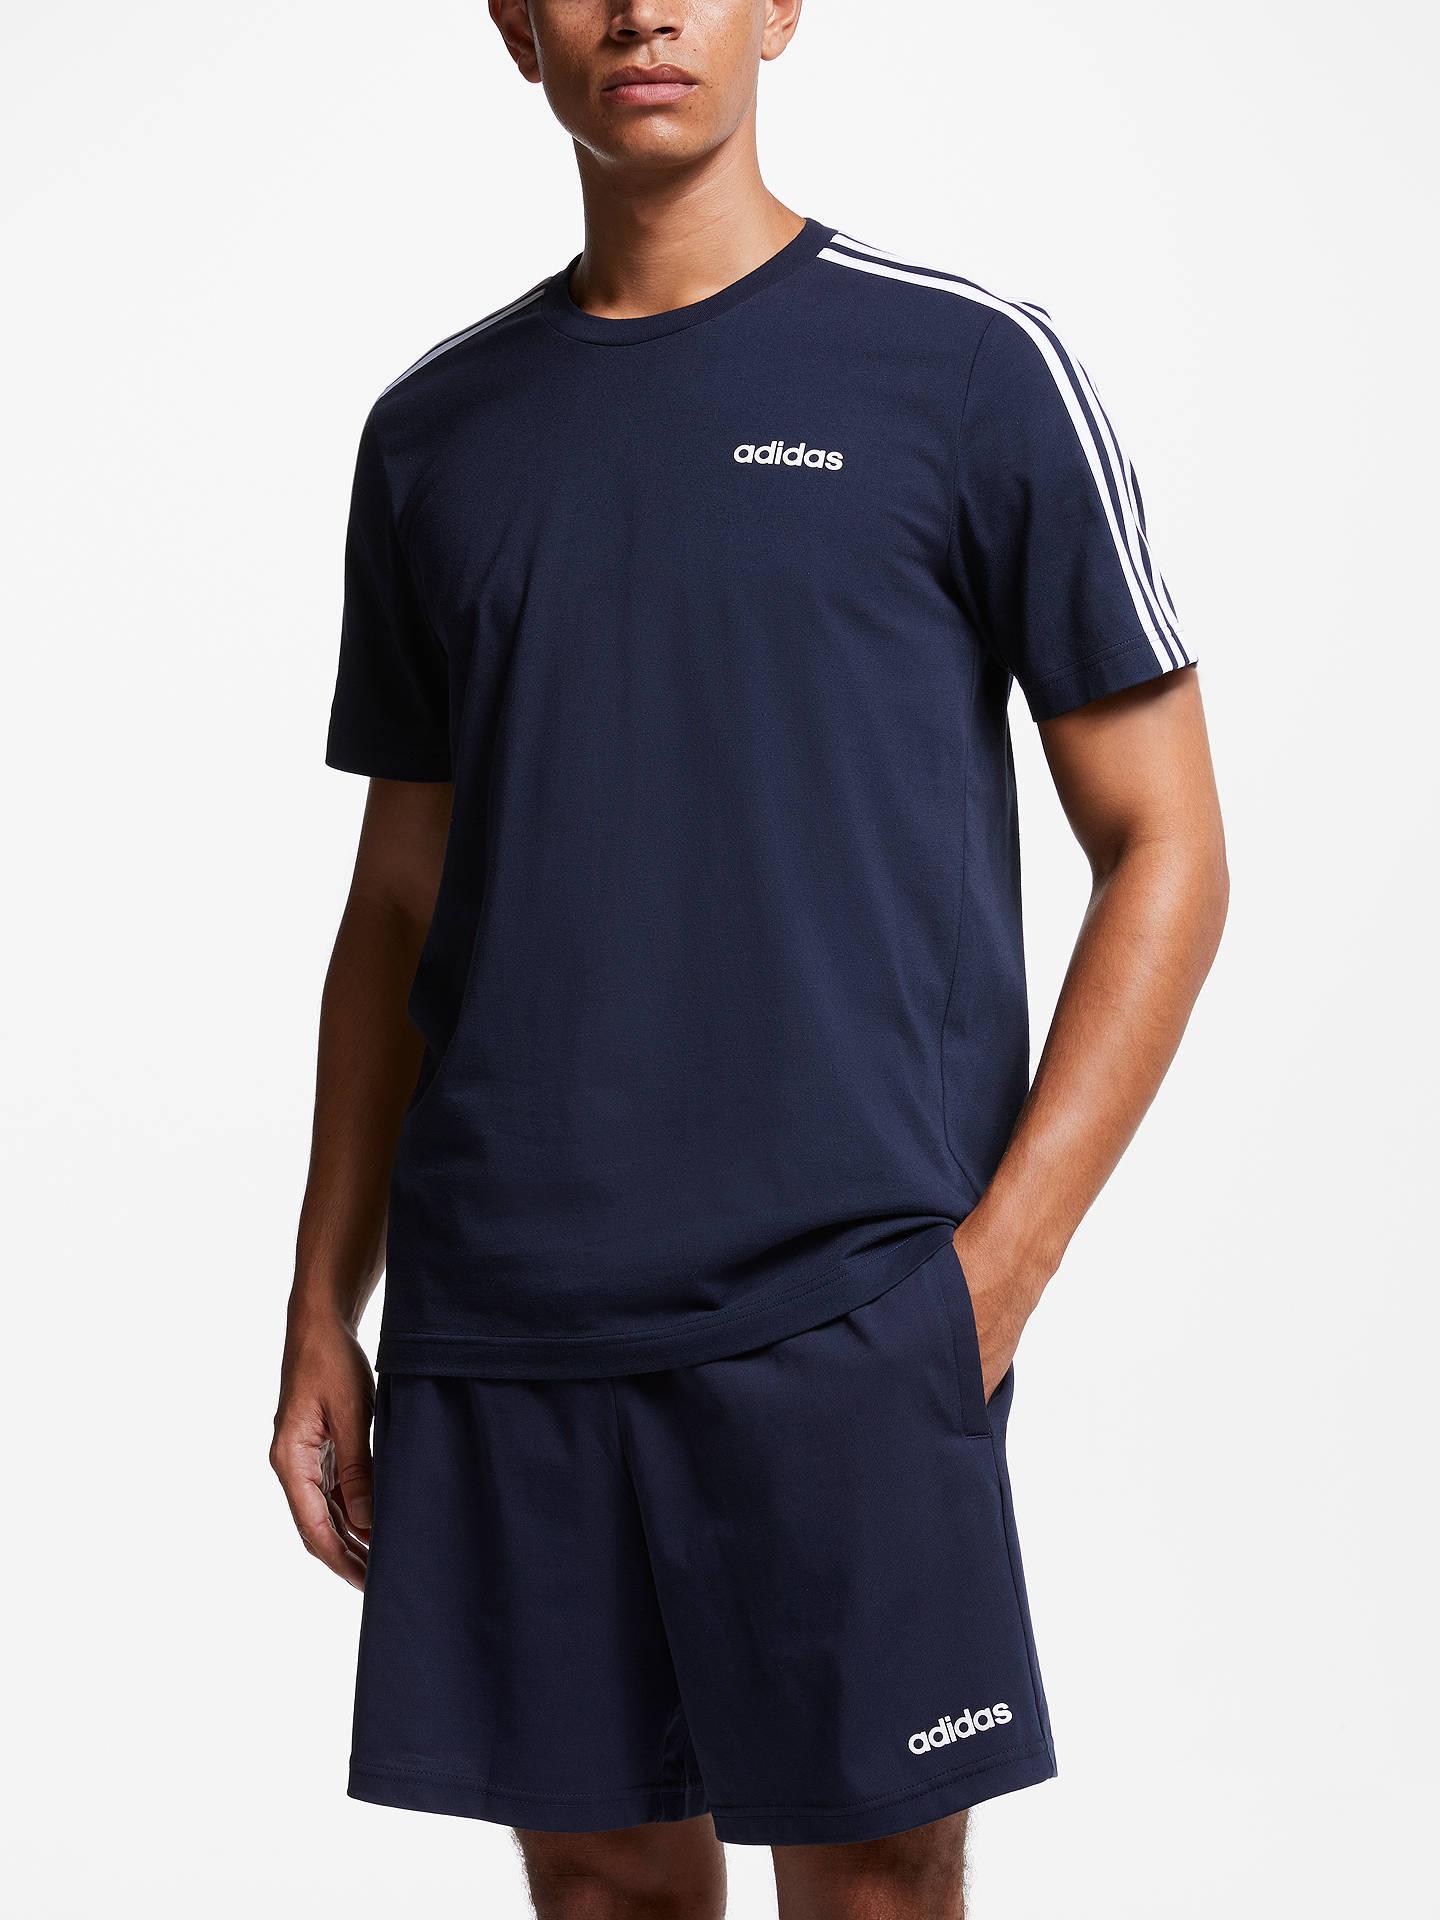 886903b4fdea7 adidas Essentials 3-Stripes T-Shirt at John Lewis   Partners